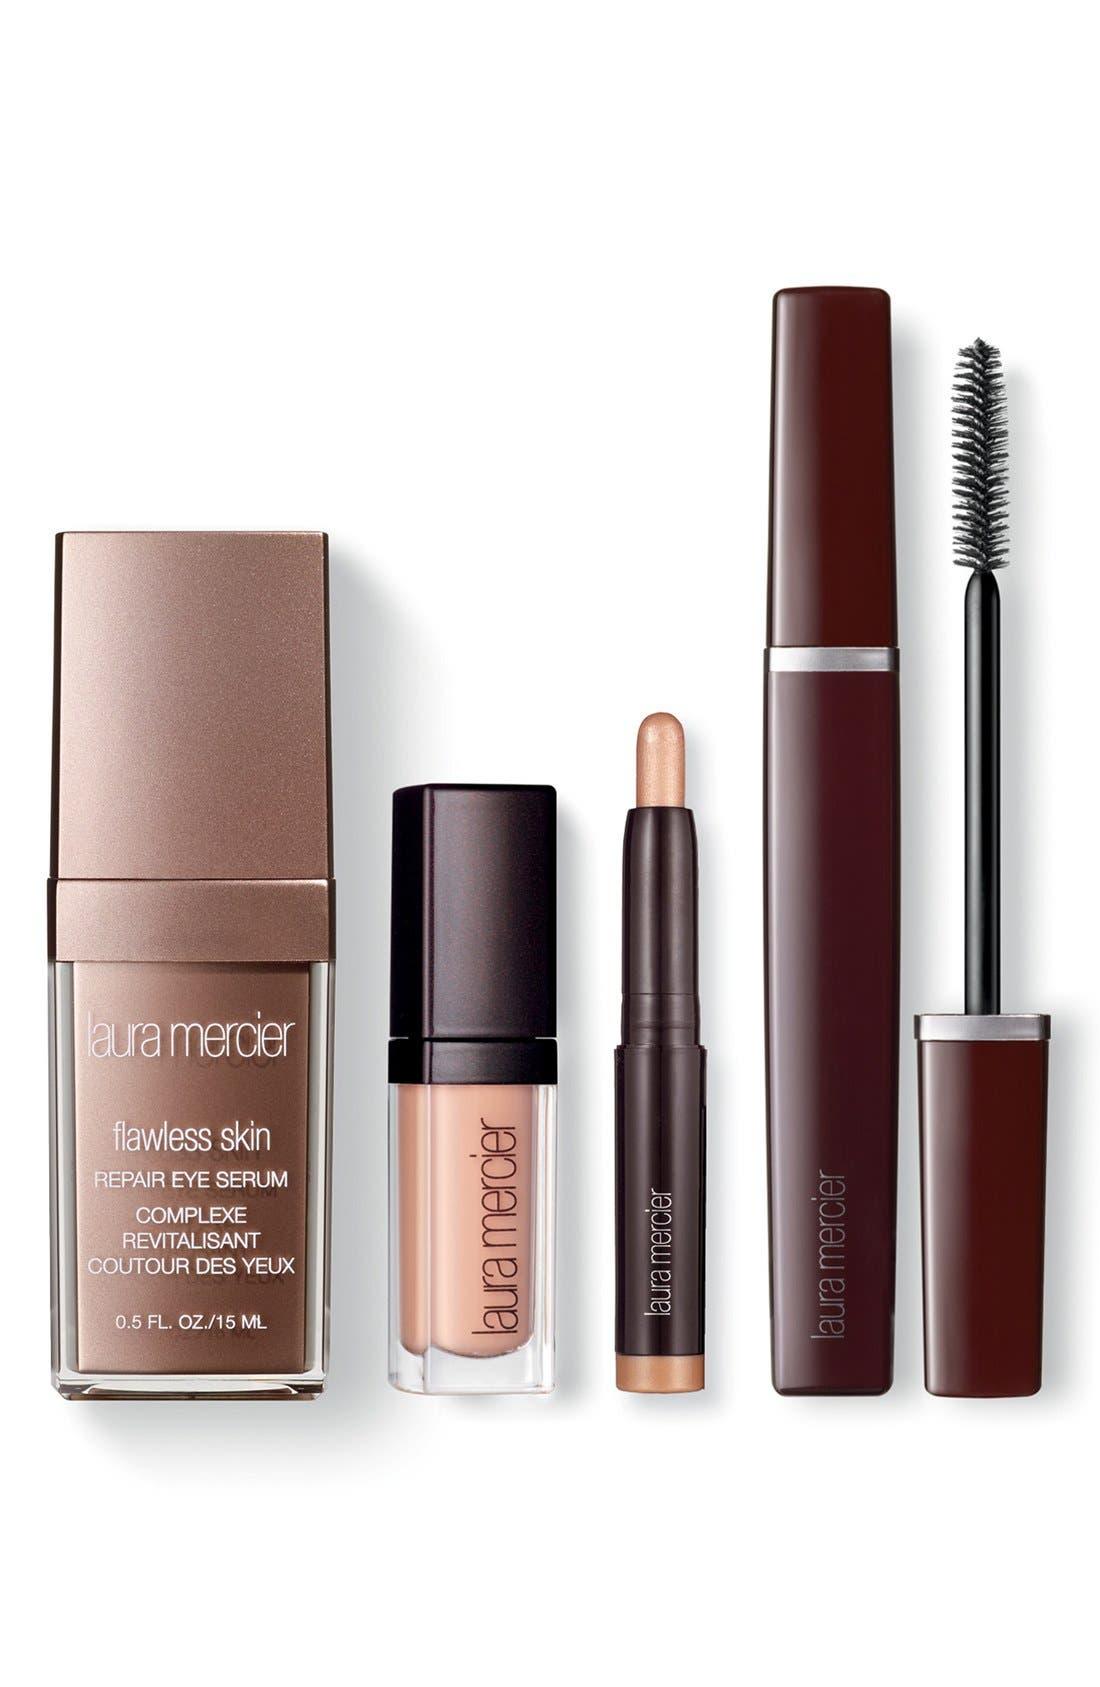 Laura Mercier Beauty Gifts & Value Sets   Nordstrom